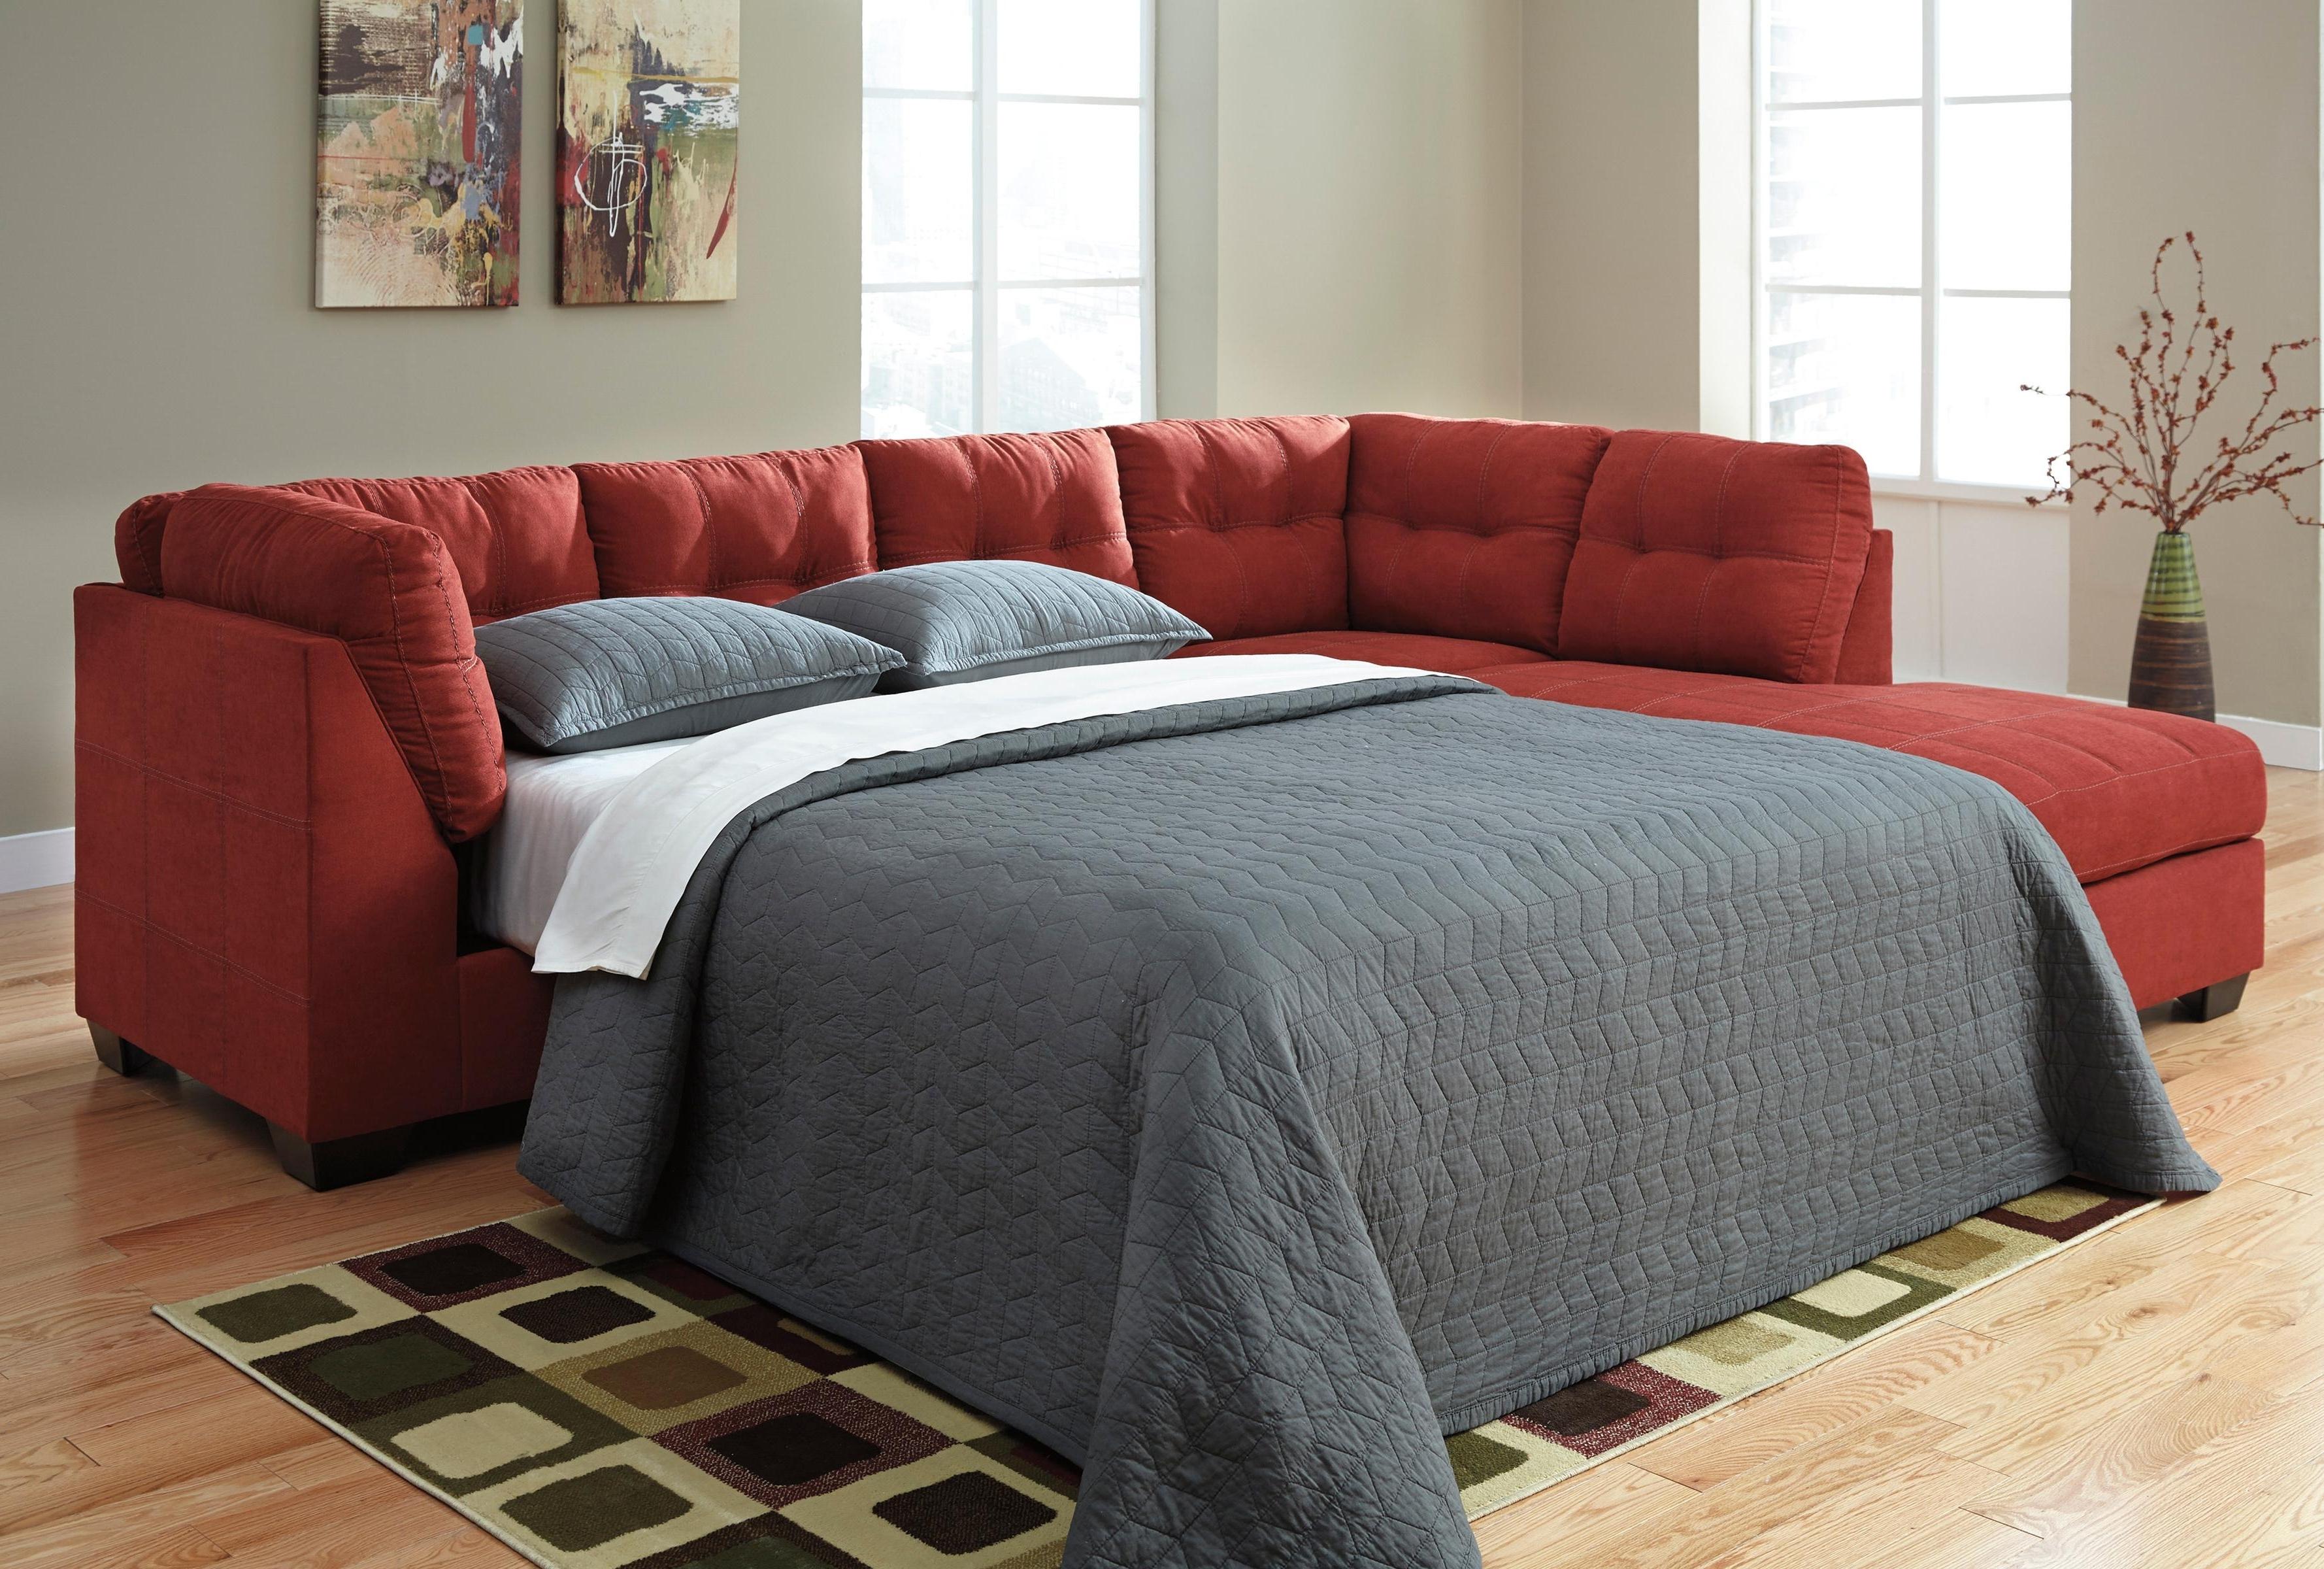 Favorite Furniture : Ashley Furniture Zeth Sofa Ashley Furniture Throughout Joplin Mo Sectional Sofas (View 6 of 20)